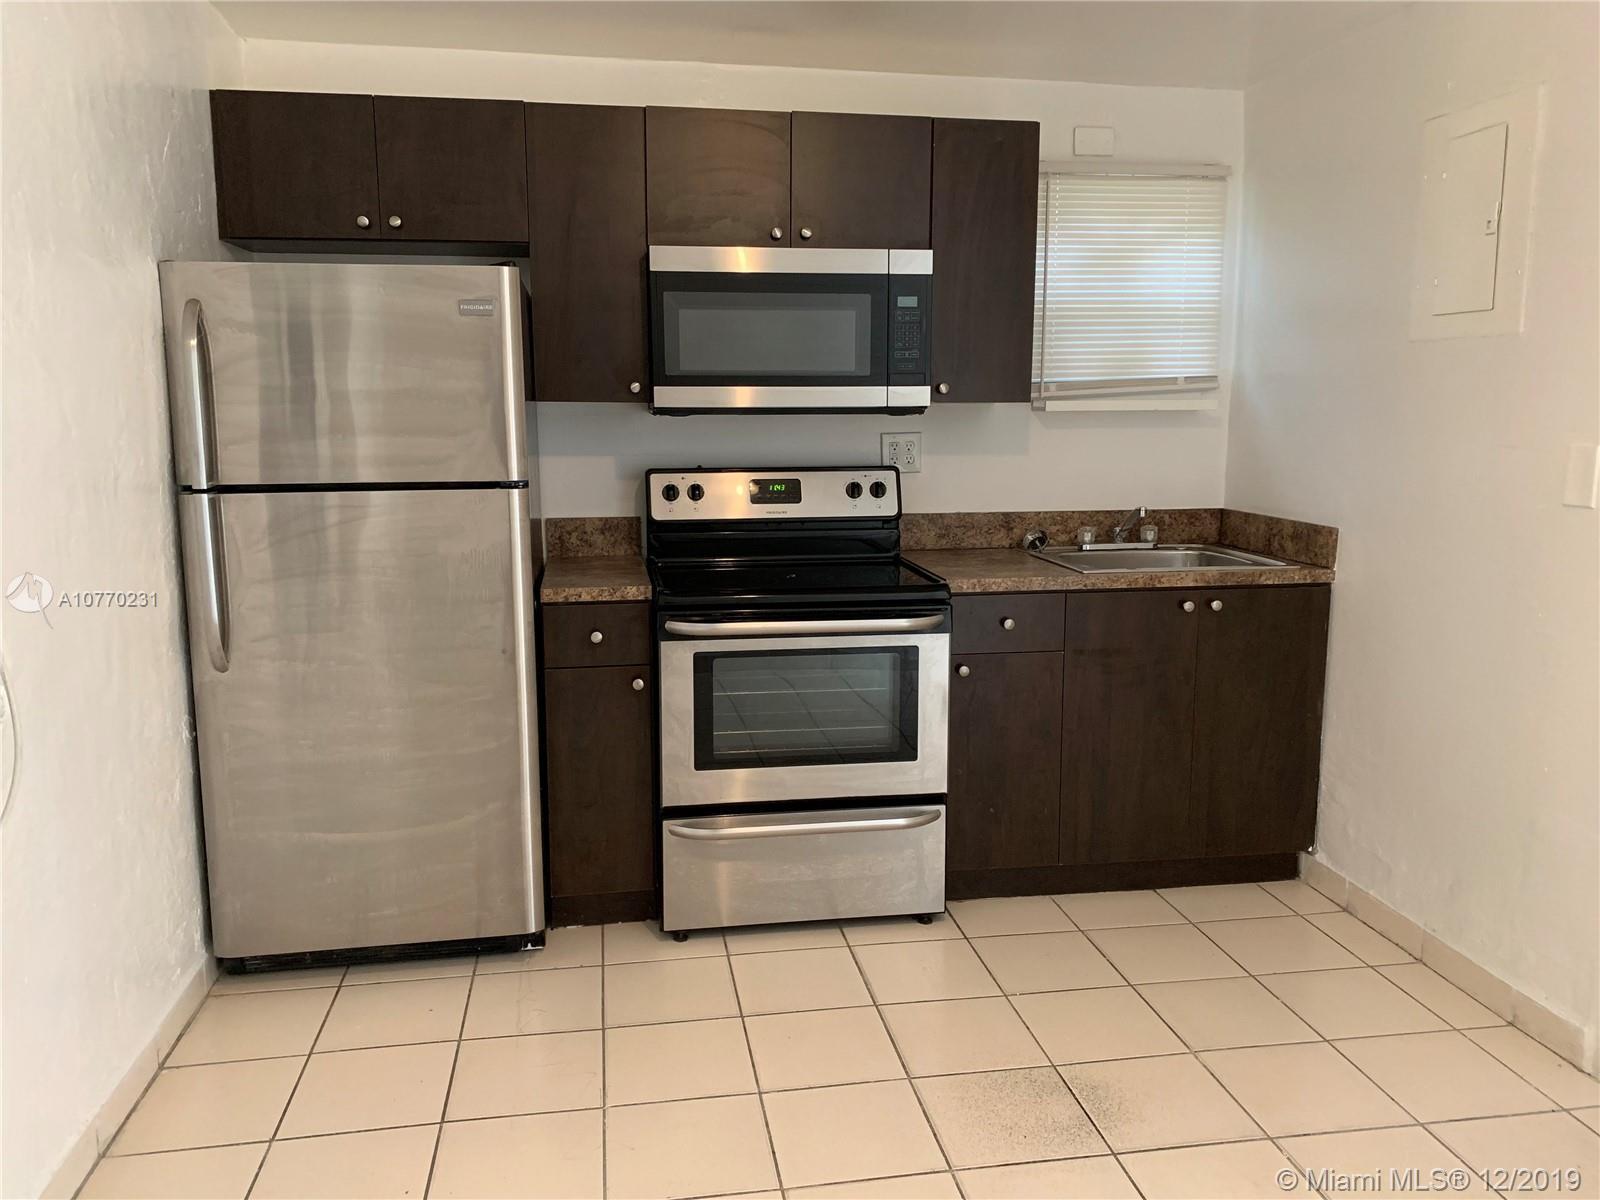 619 NE 88 St #3 For Sale A10770231, FL